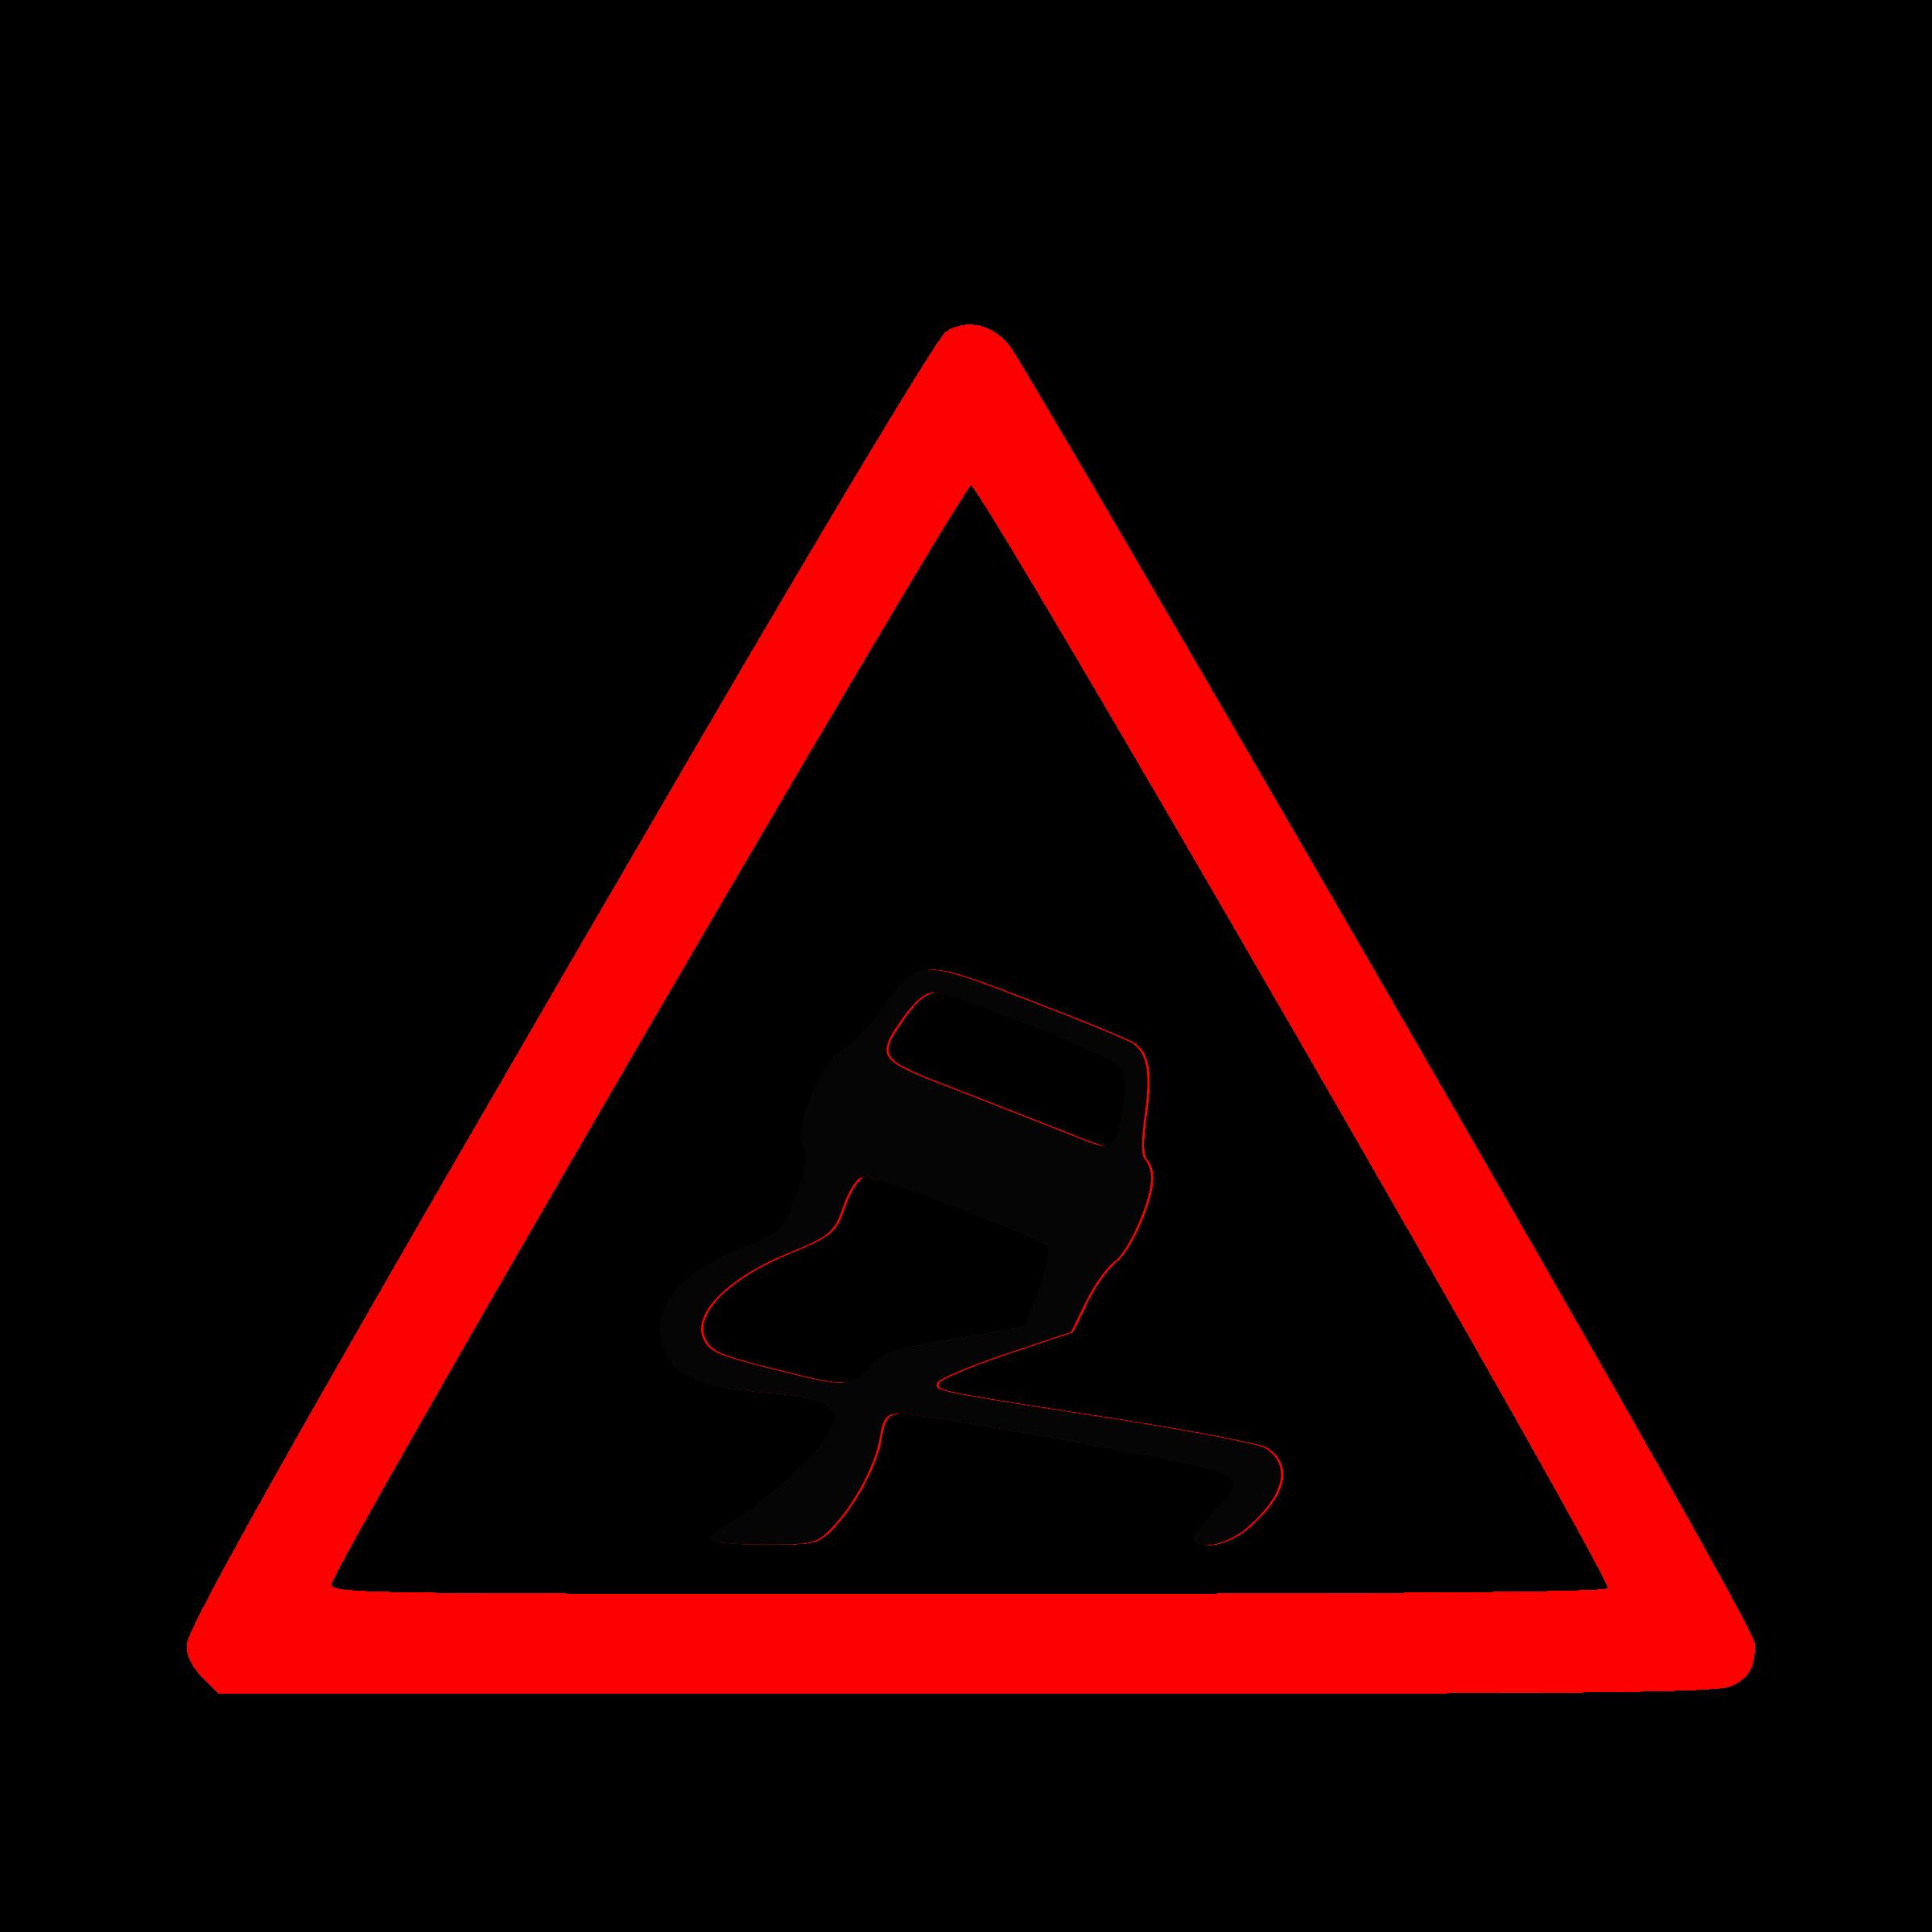 Car sign clipart transparent Clipart - Warning Sliding Car Roadsign transparent